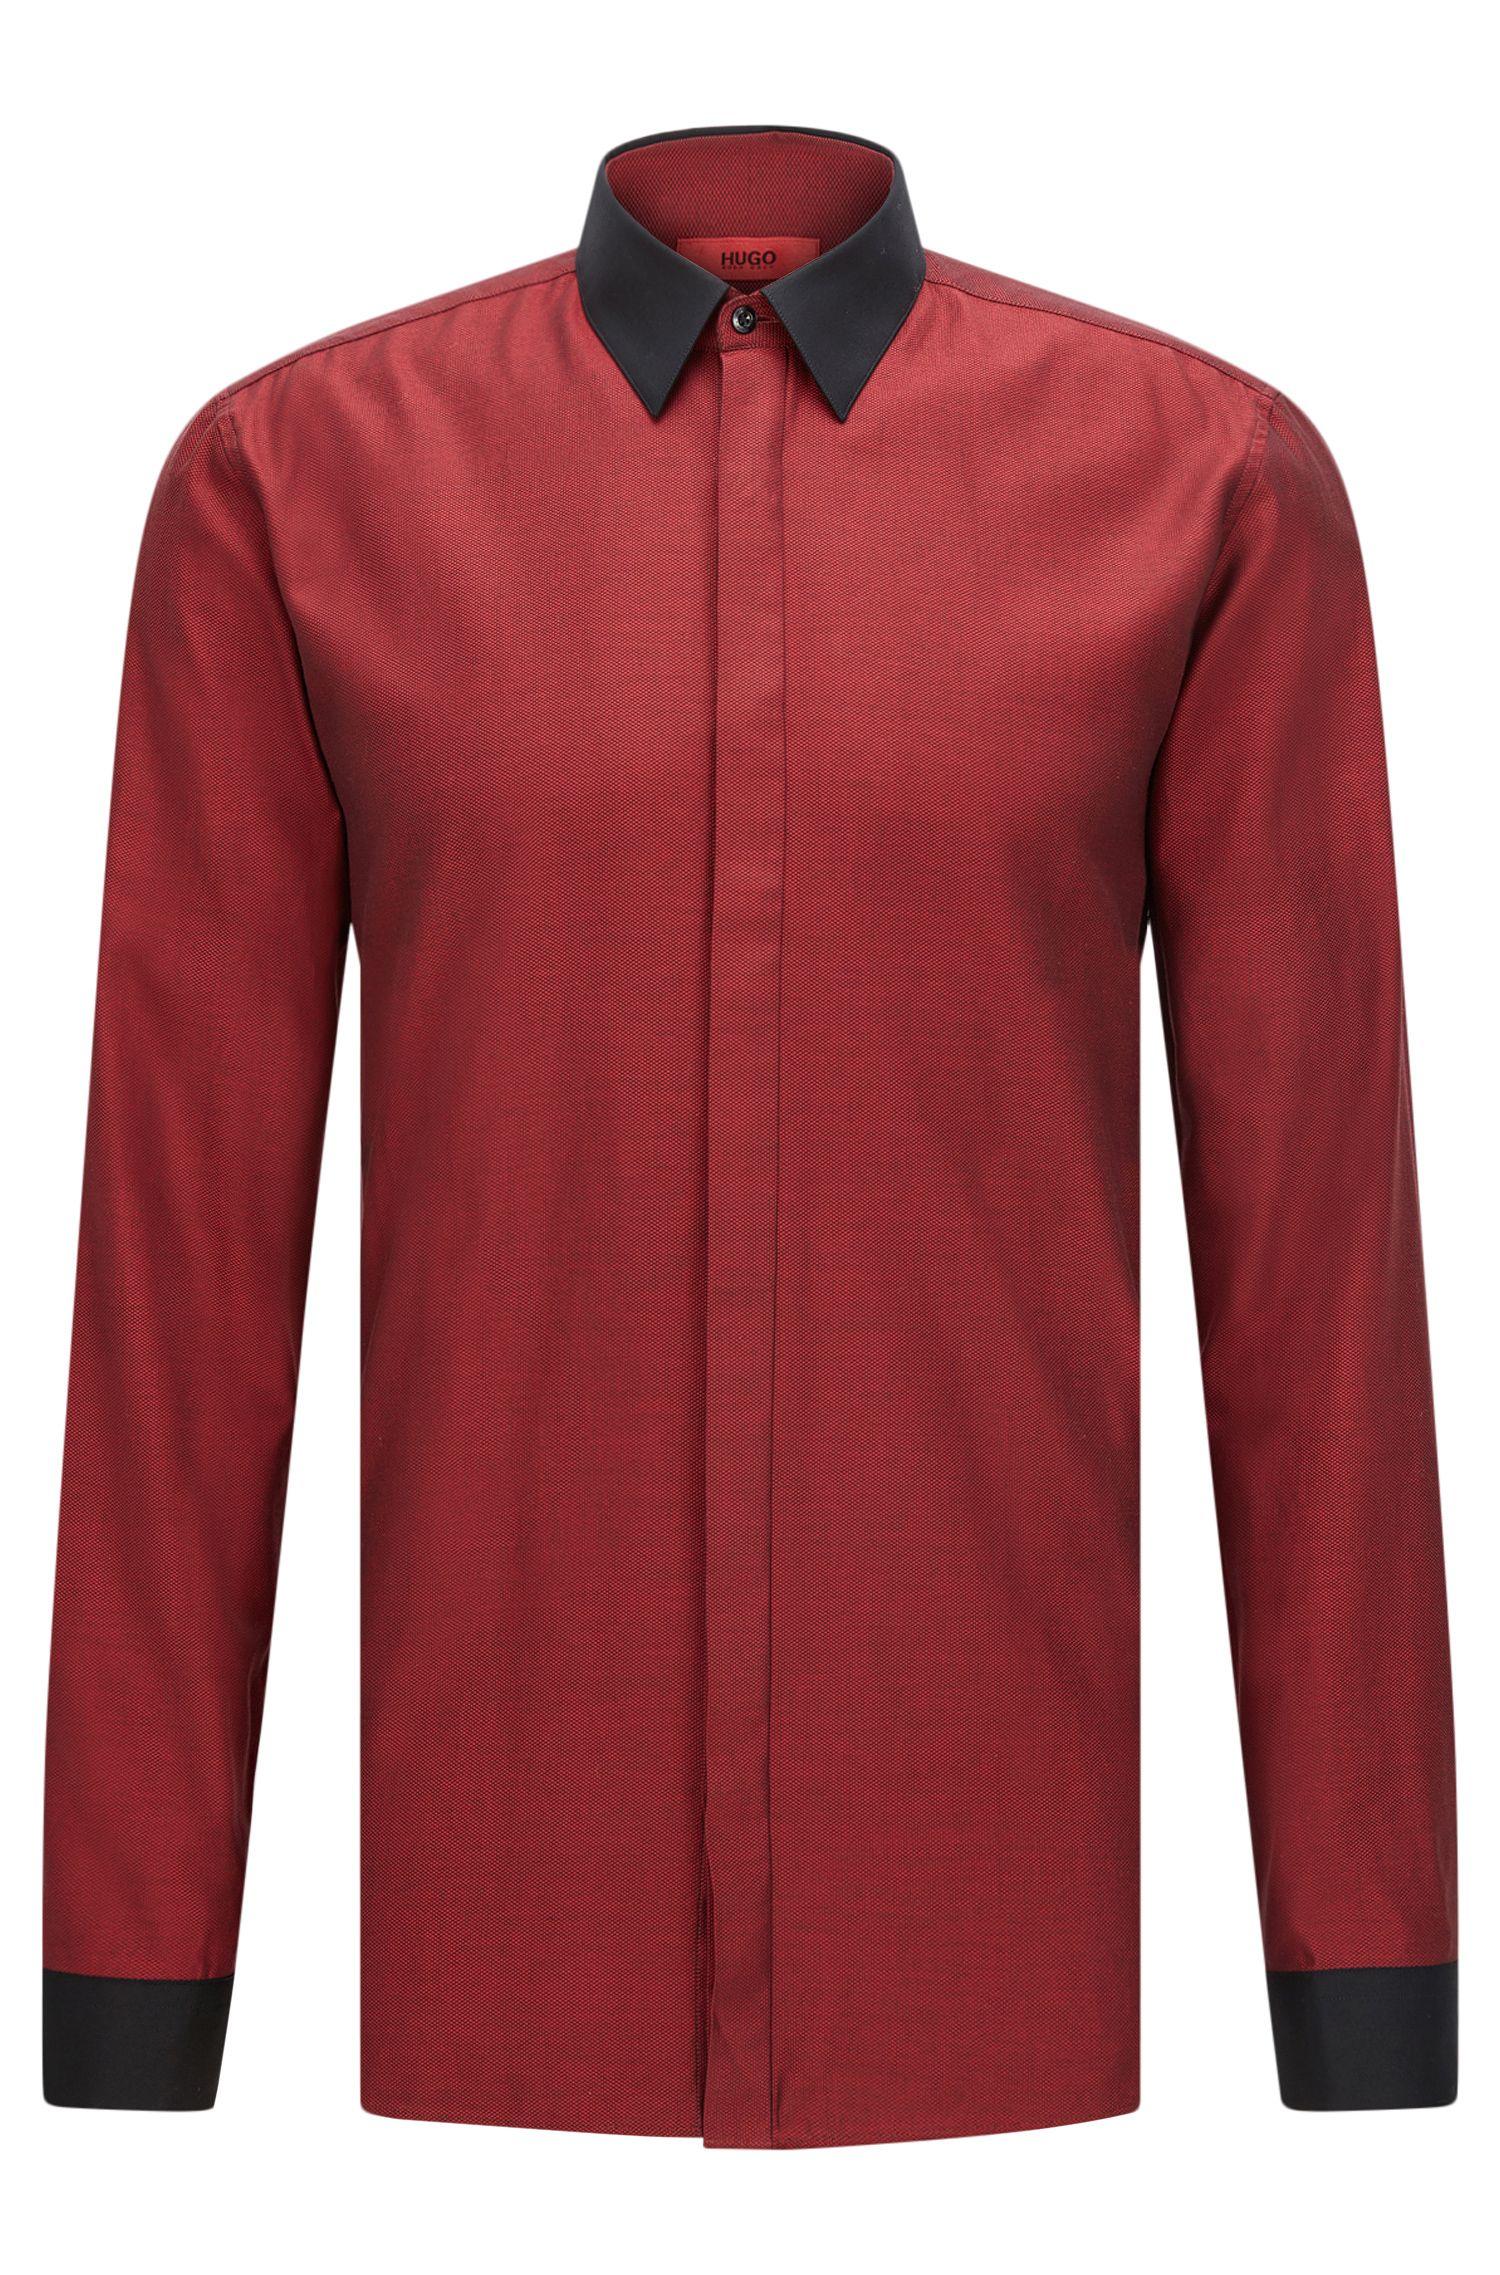 'Elisha' | Extra Slim Fit, Colorblock Easy Iron Cotton Dress Shirt